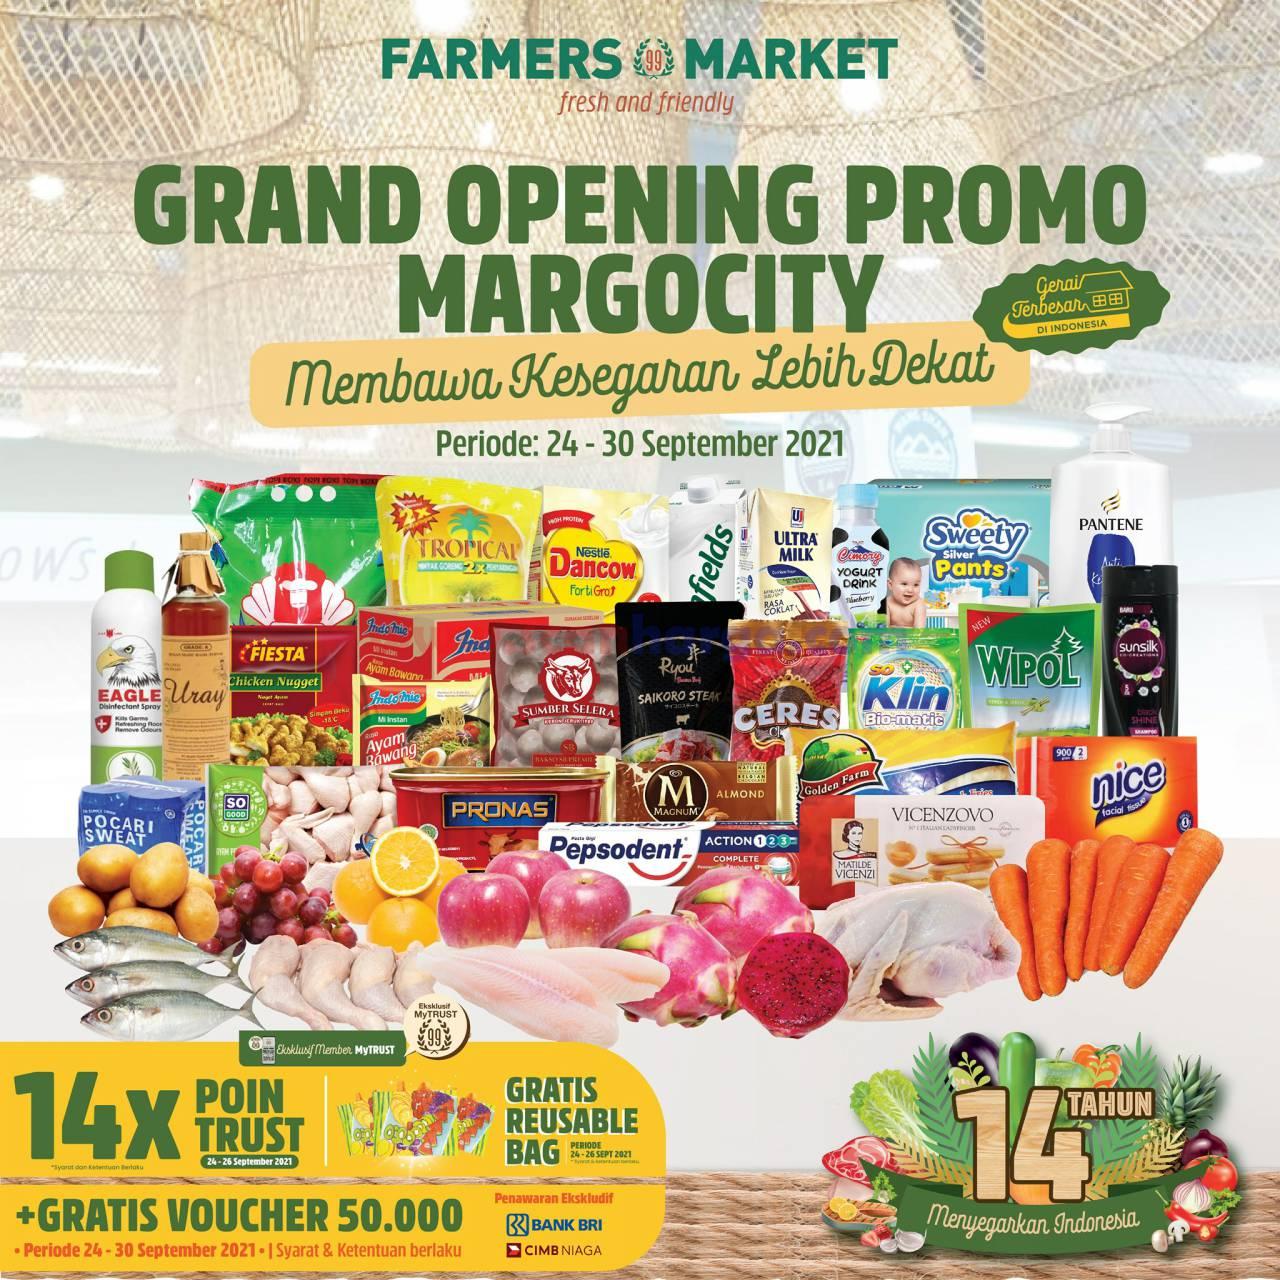 Farmers Market Margo City Depok Promo Grand Opening